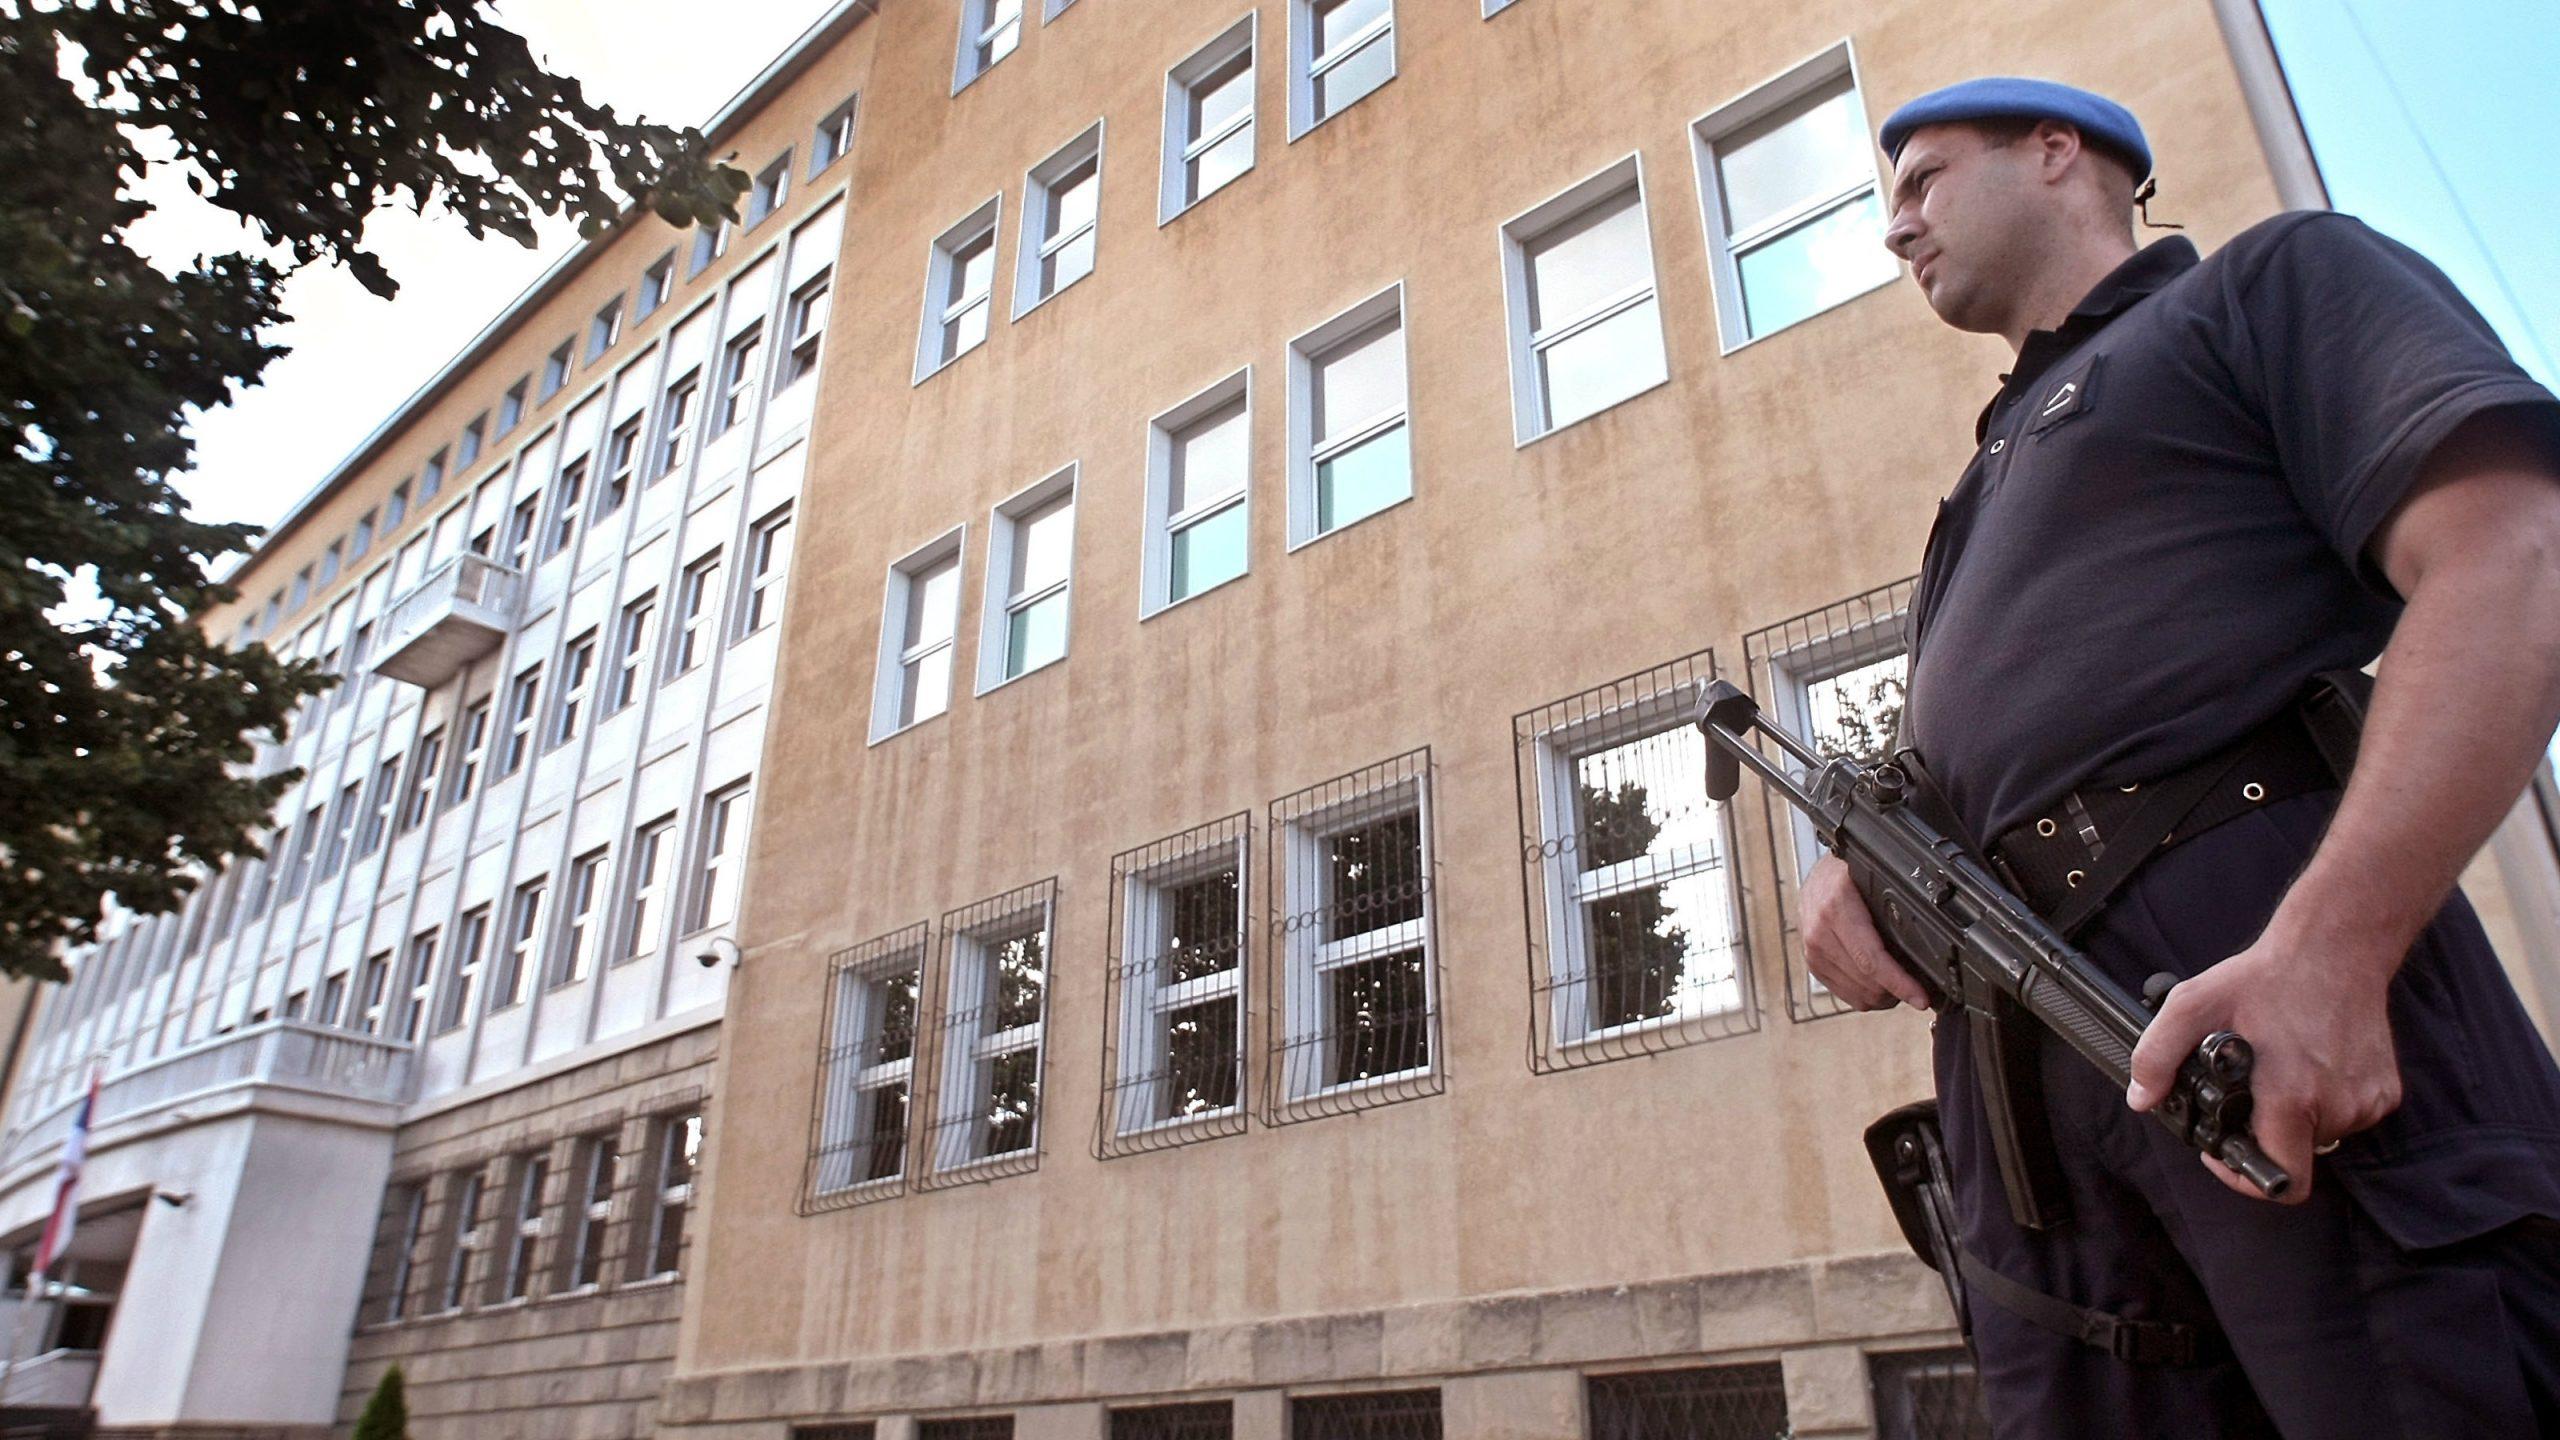 Viši sud u Beogradu: Neistiniti navodi da je predsednik Suda savetovao Kokezu da se ne podvrgne poligrafu 1